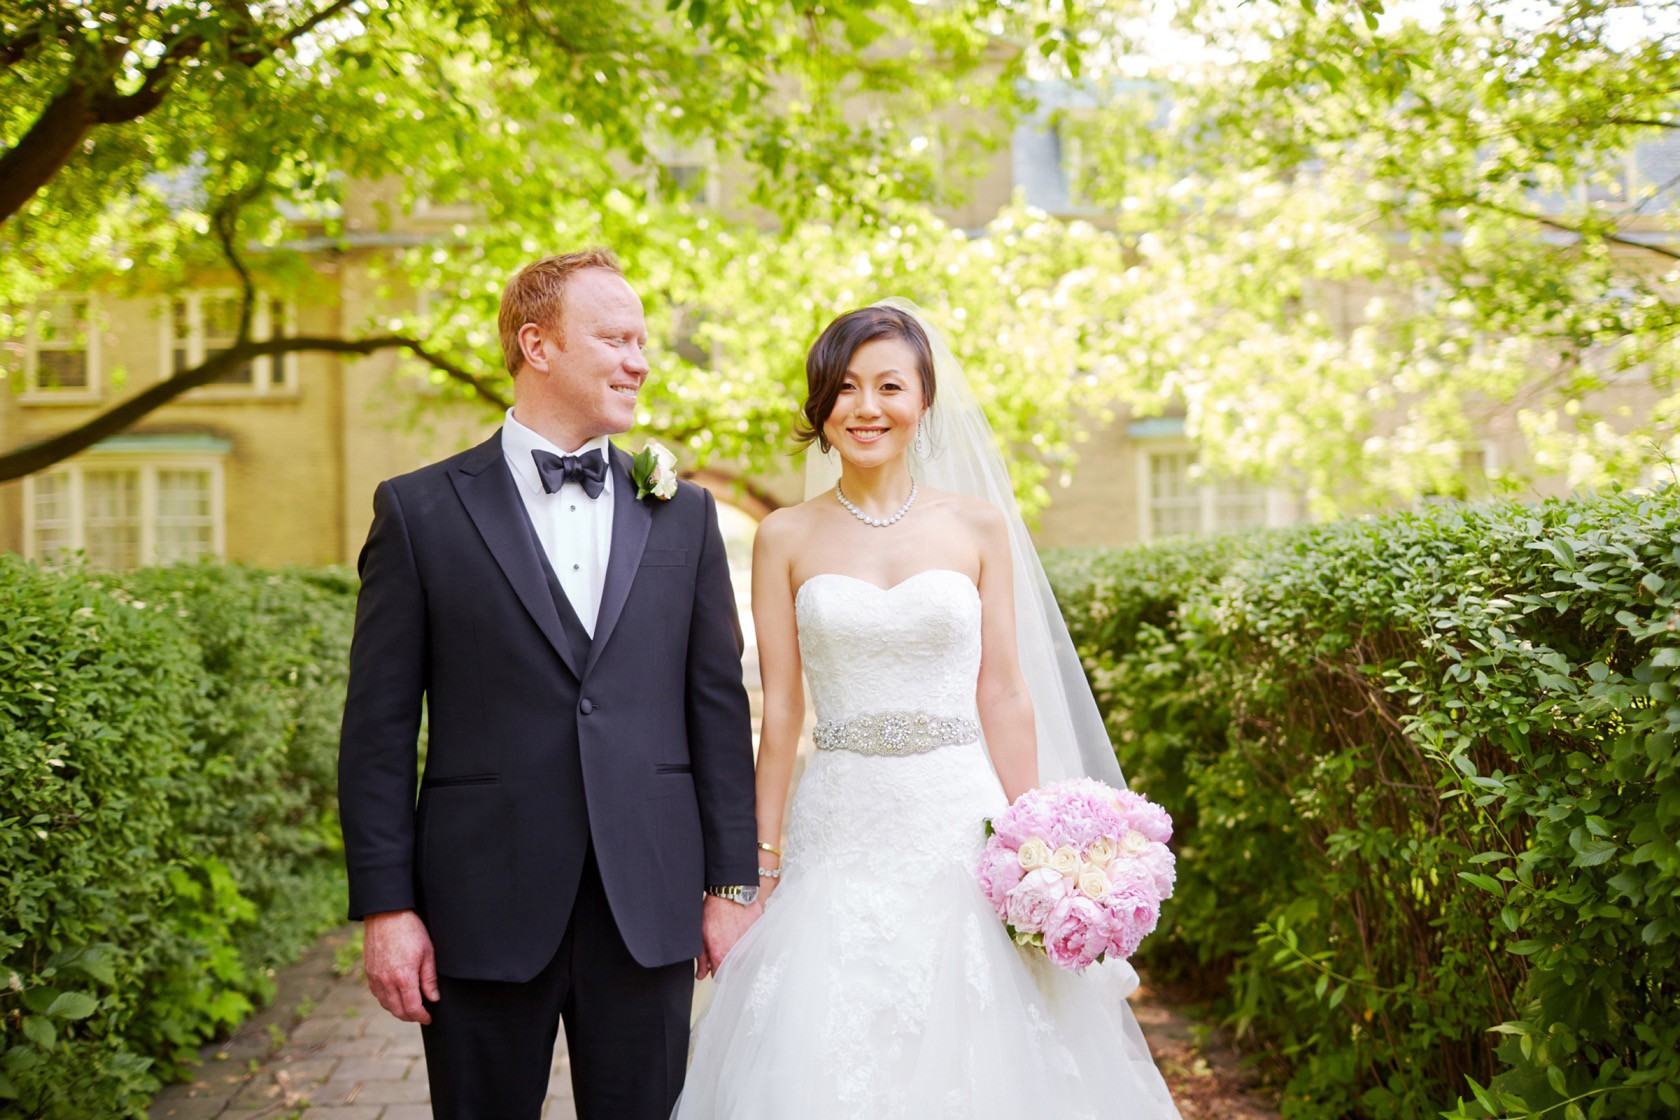 stephen sager photography 0012 fine art wedding photography